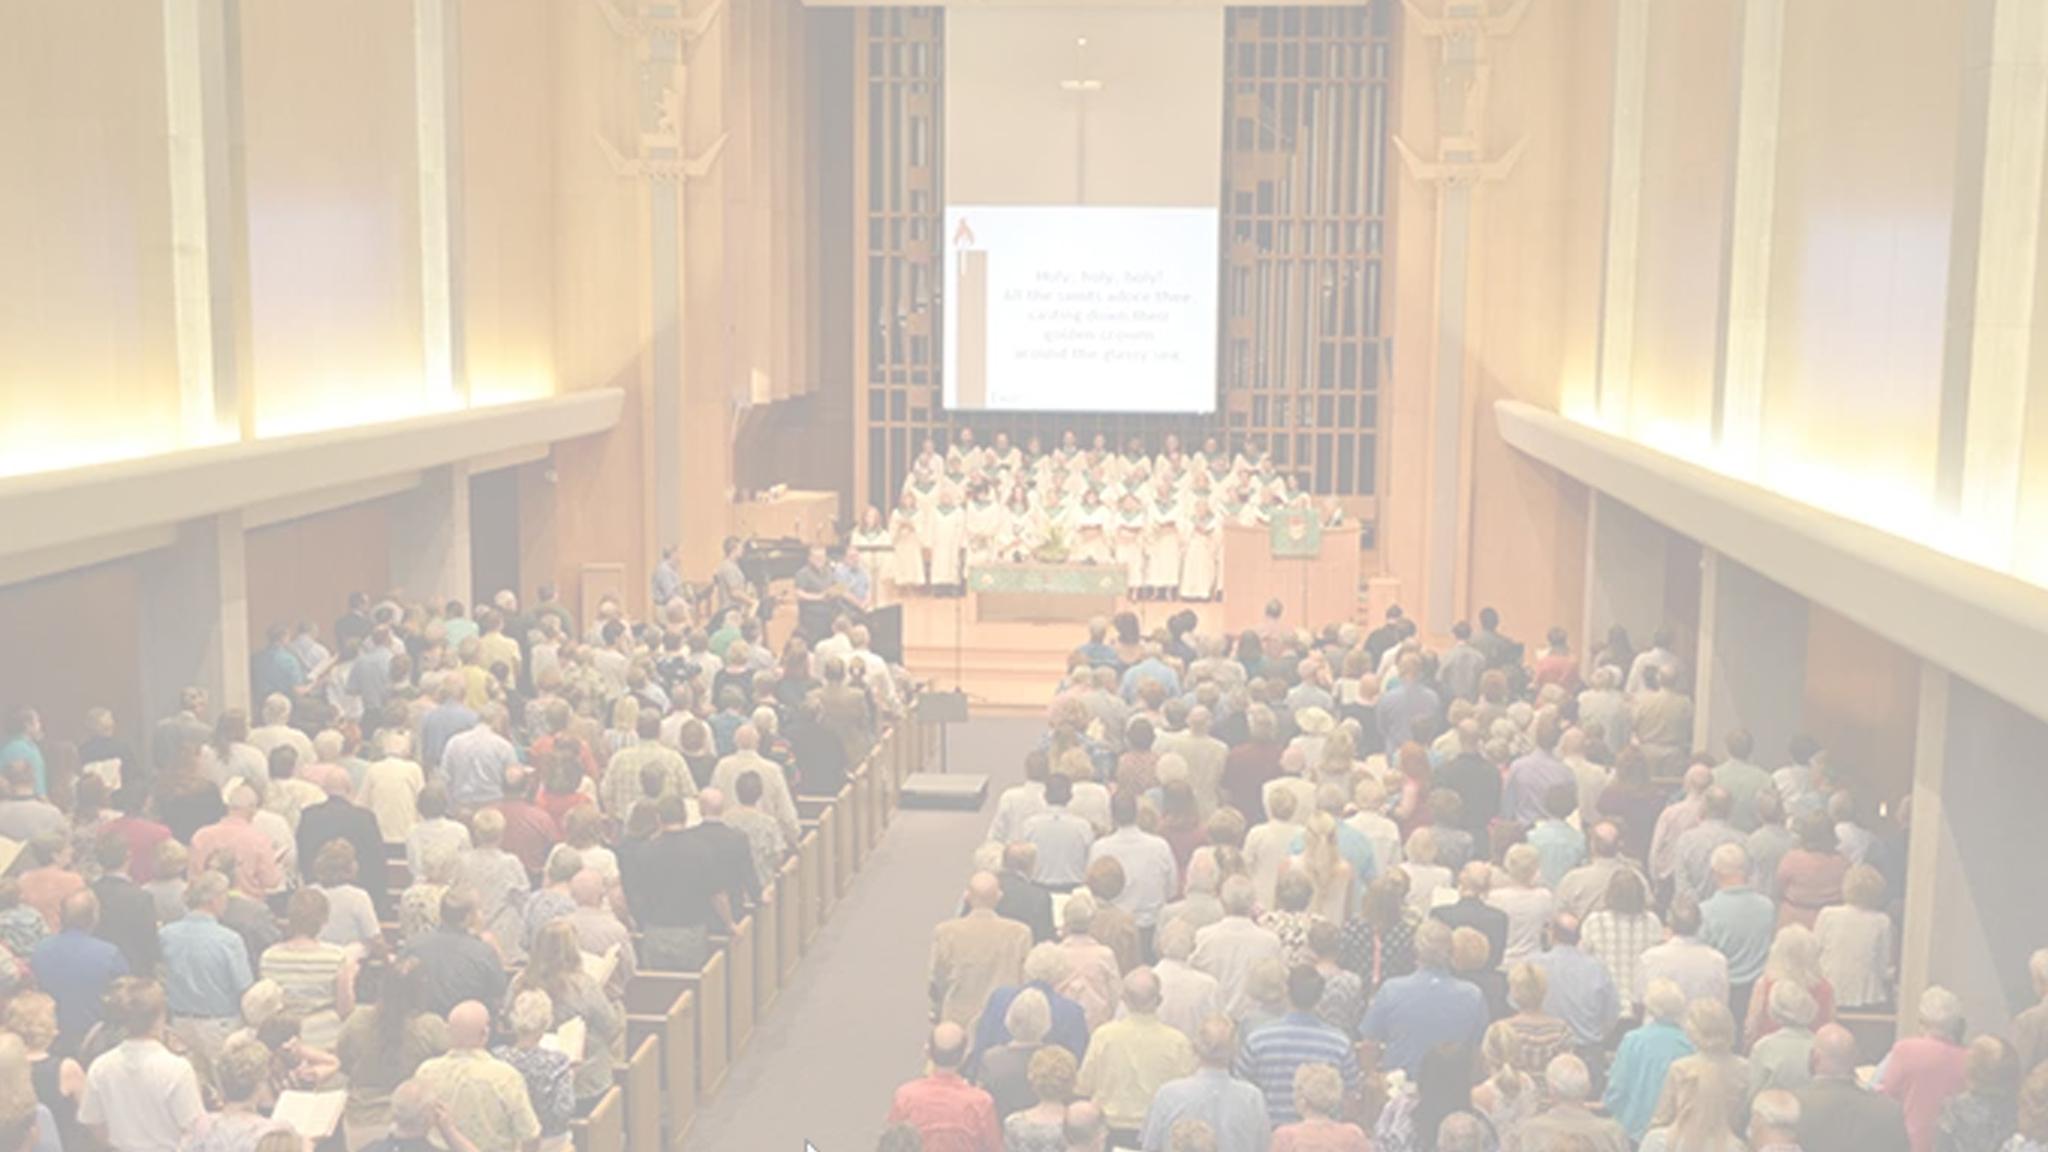 Indoor Traditional Worship with Wesley UMC Bloomington @ Wesley United Methodist Church Bloomington